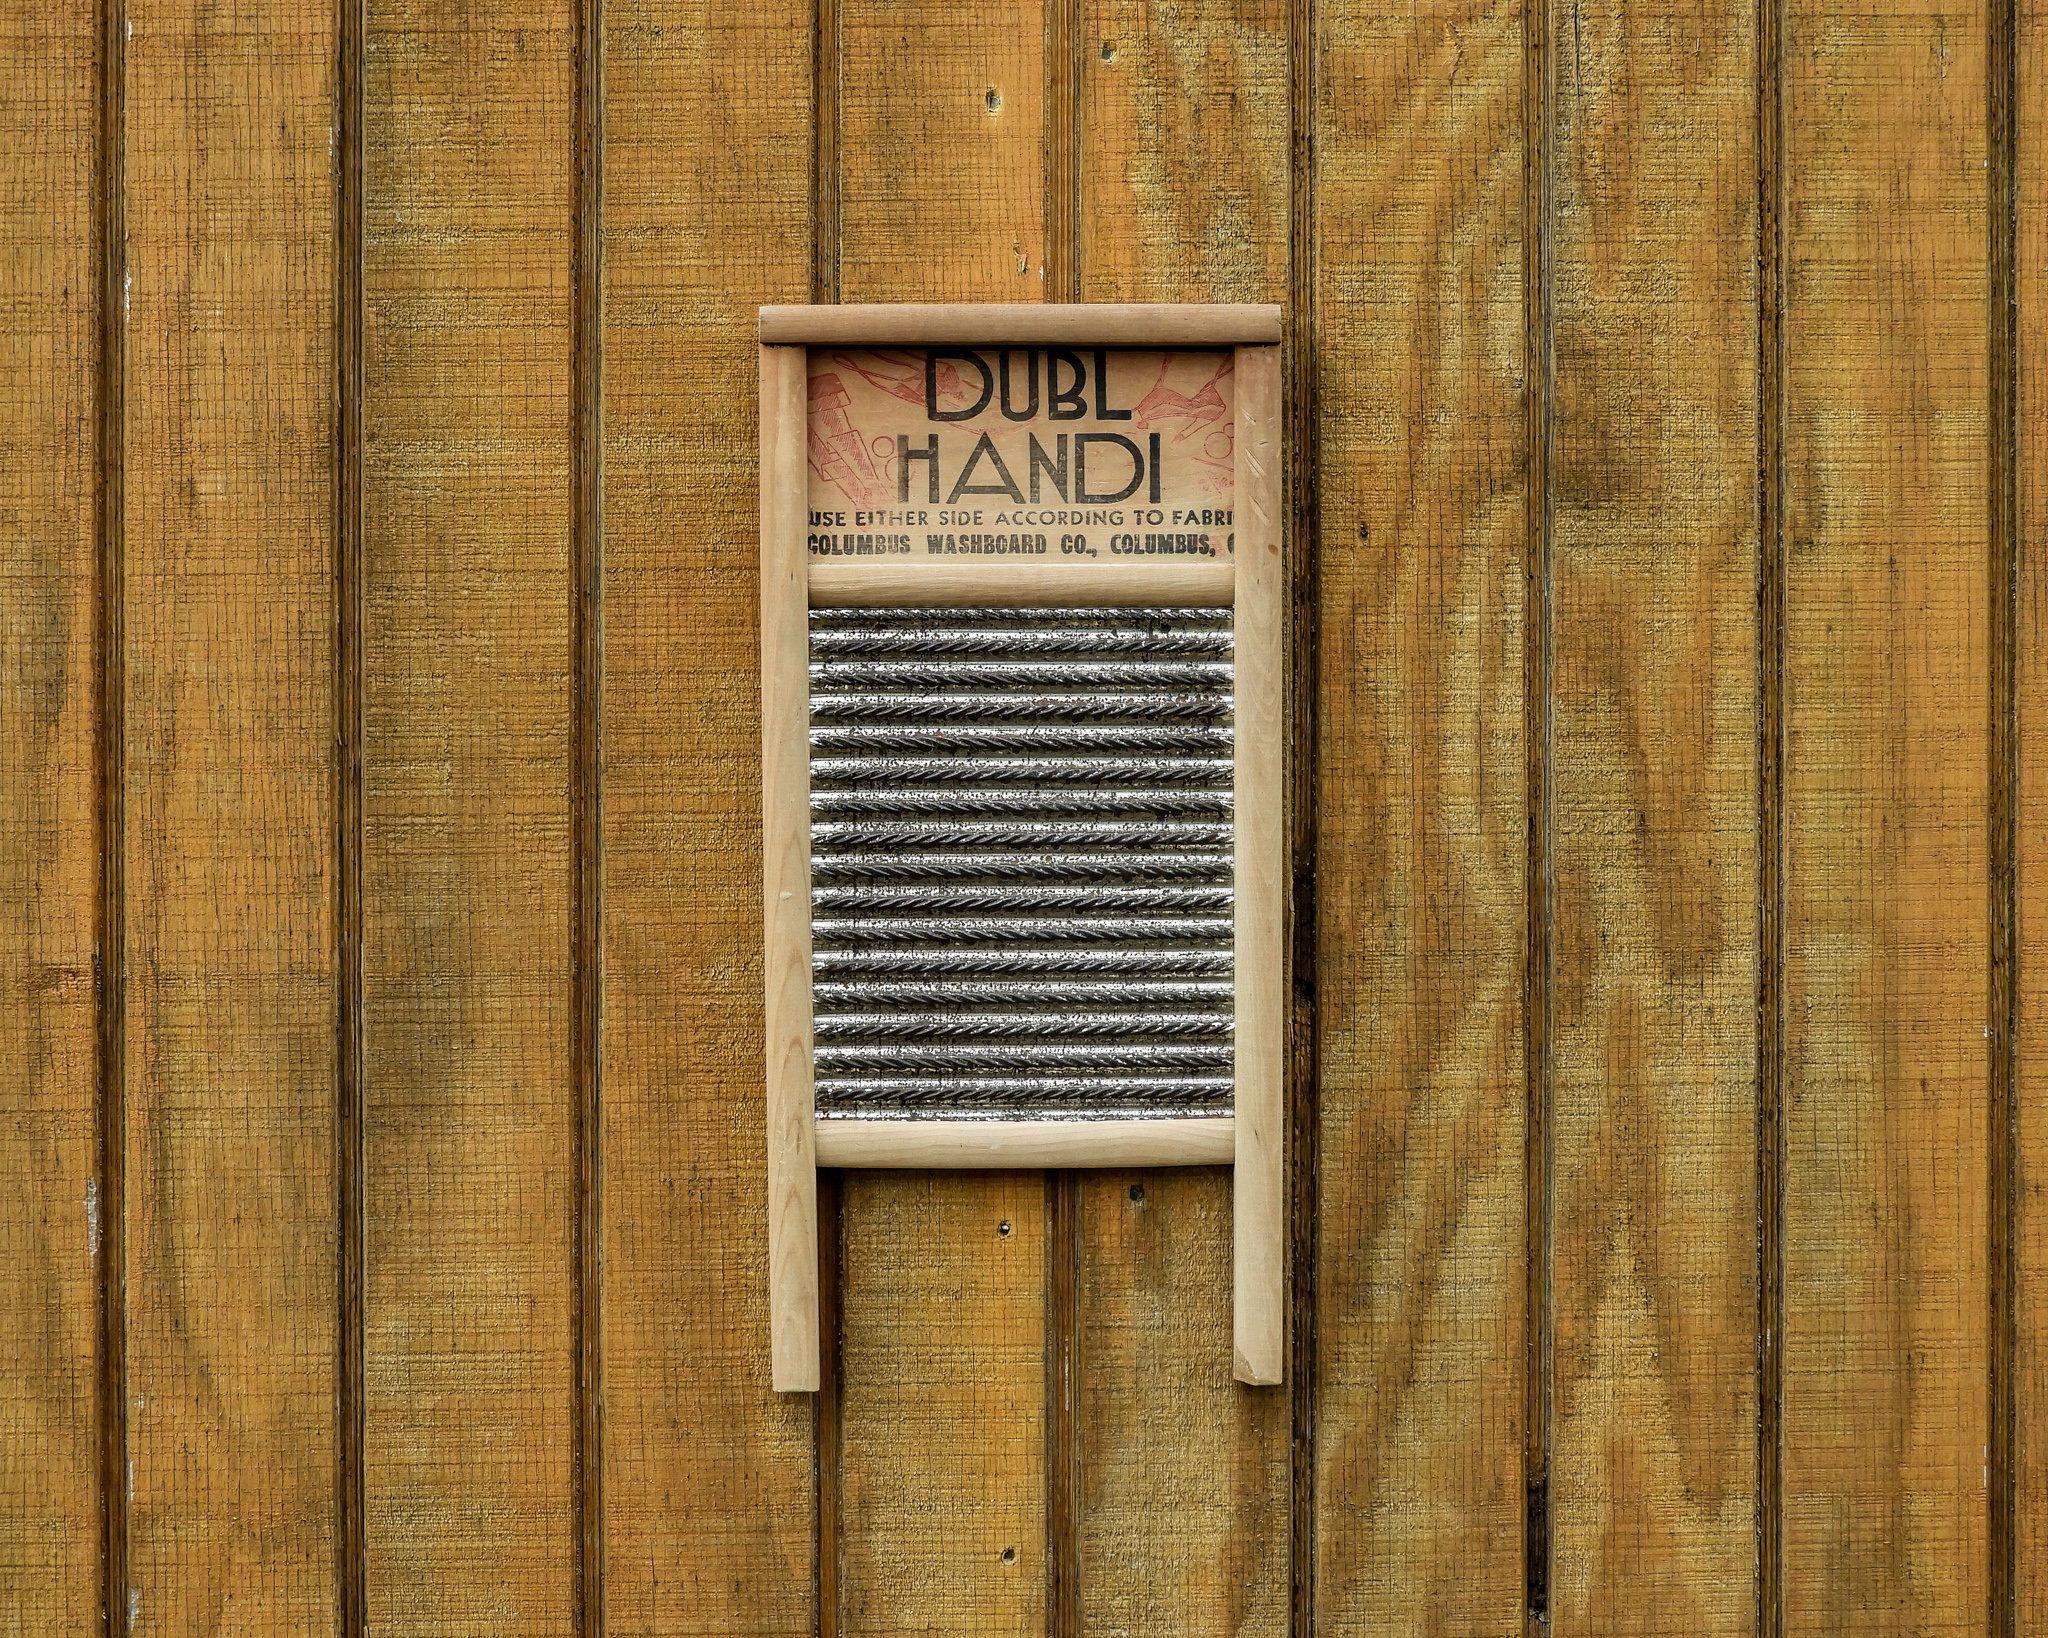 Antique Wash Board Dubl Handi Art Deco Wood Metal Red W Black Light Tone Wall Hanging Rustic Chrome Home Decor Primitive Washboard In 2020 Art Deco Decor Rustic Western Decor Vintage Vases